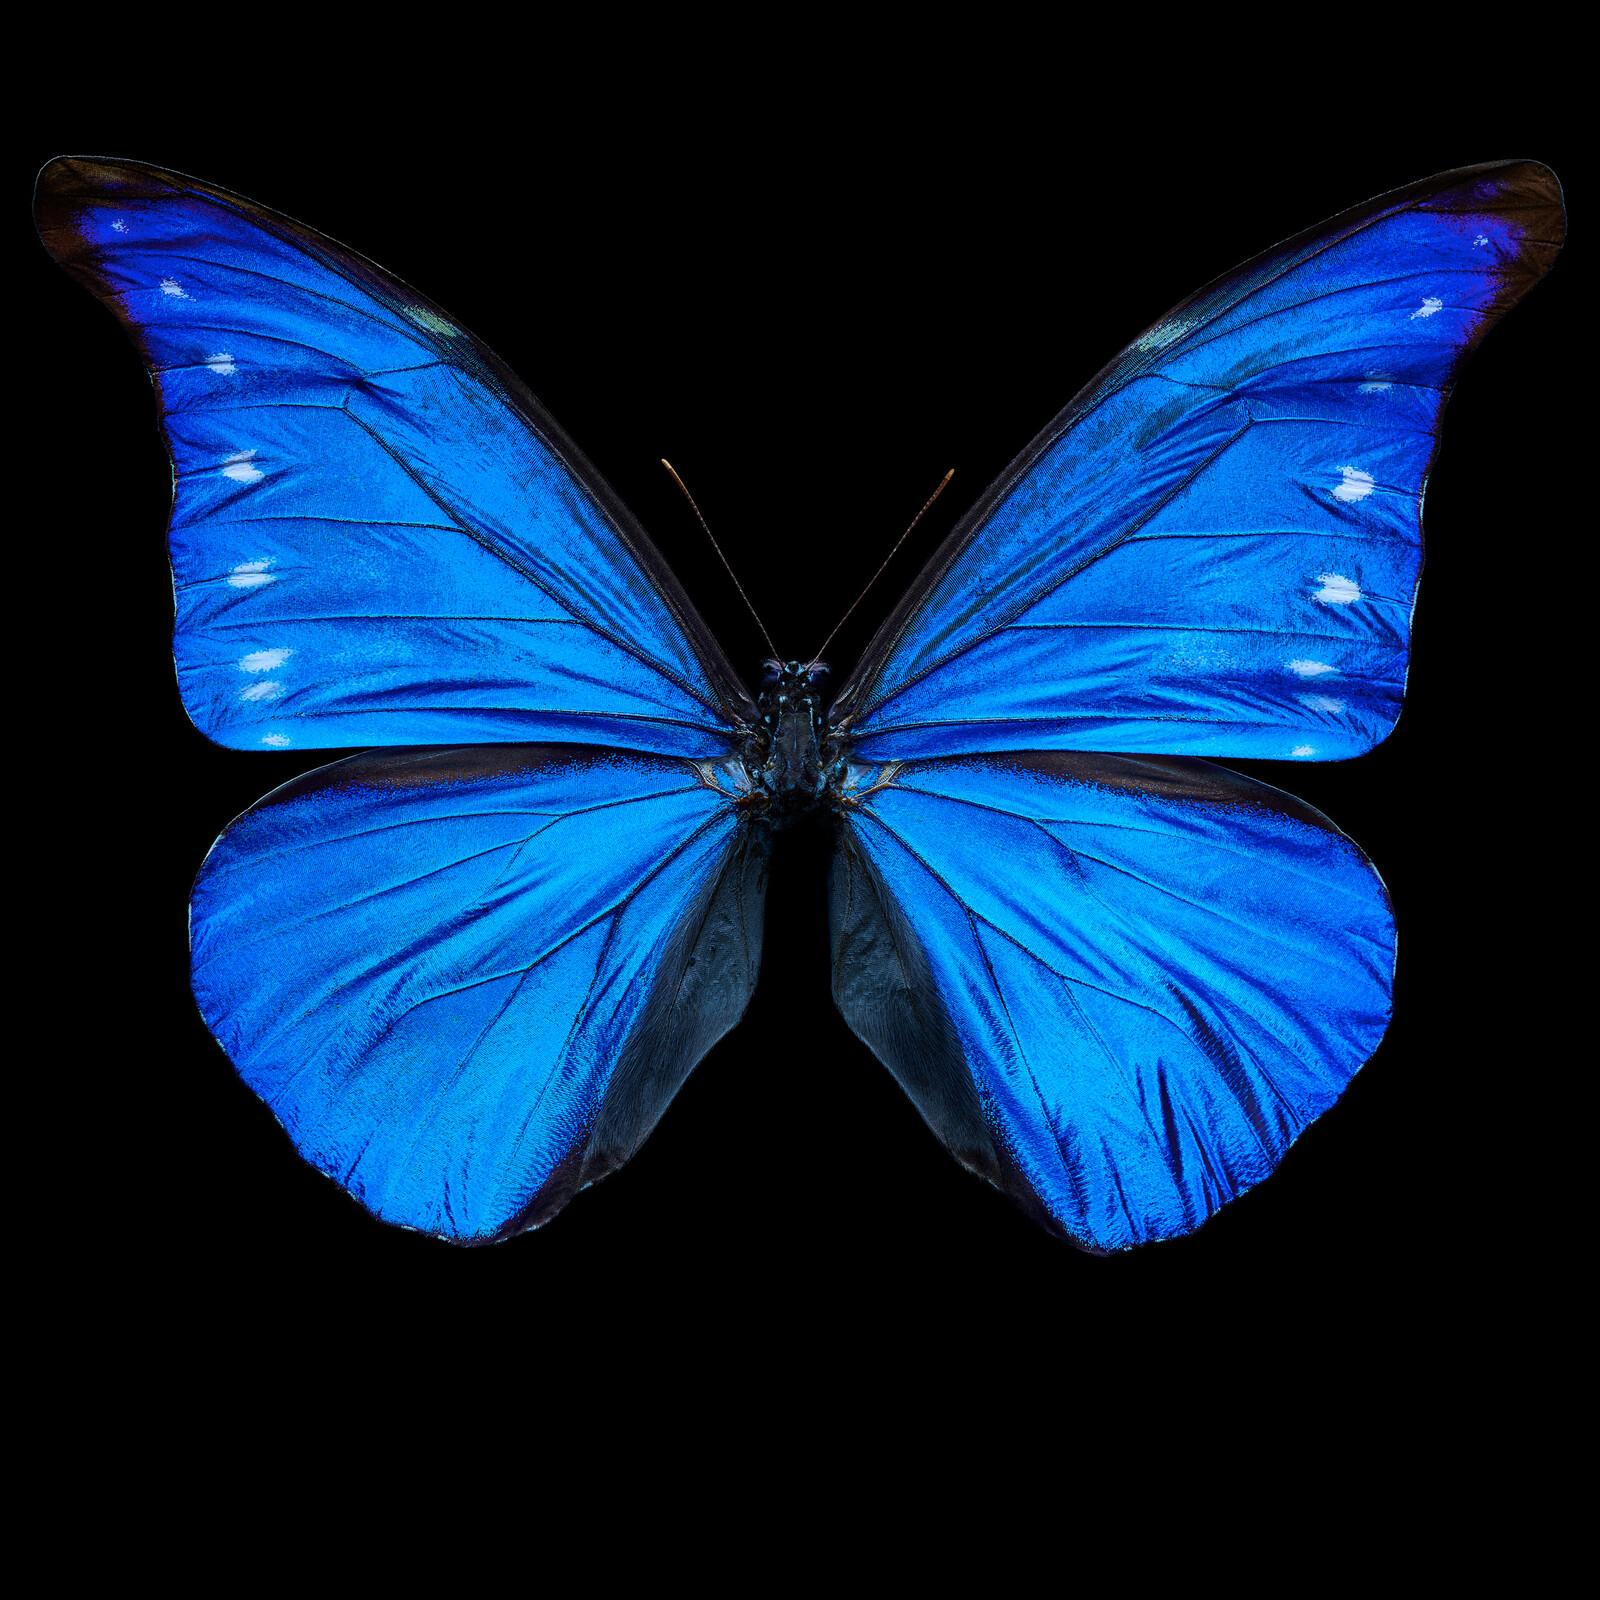 Butterfly XII - Heiko Hellwig